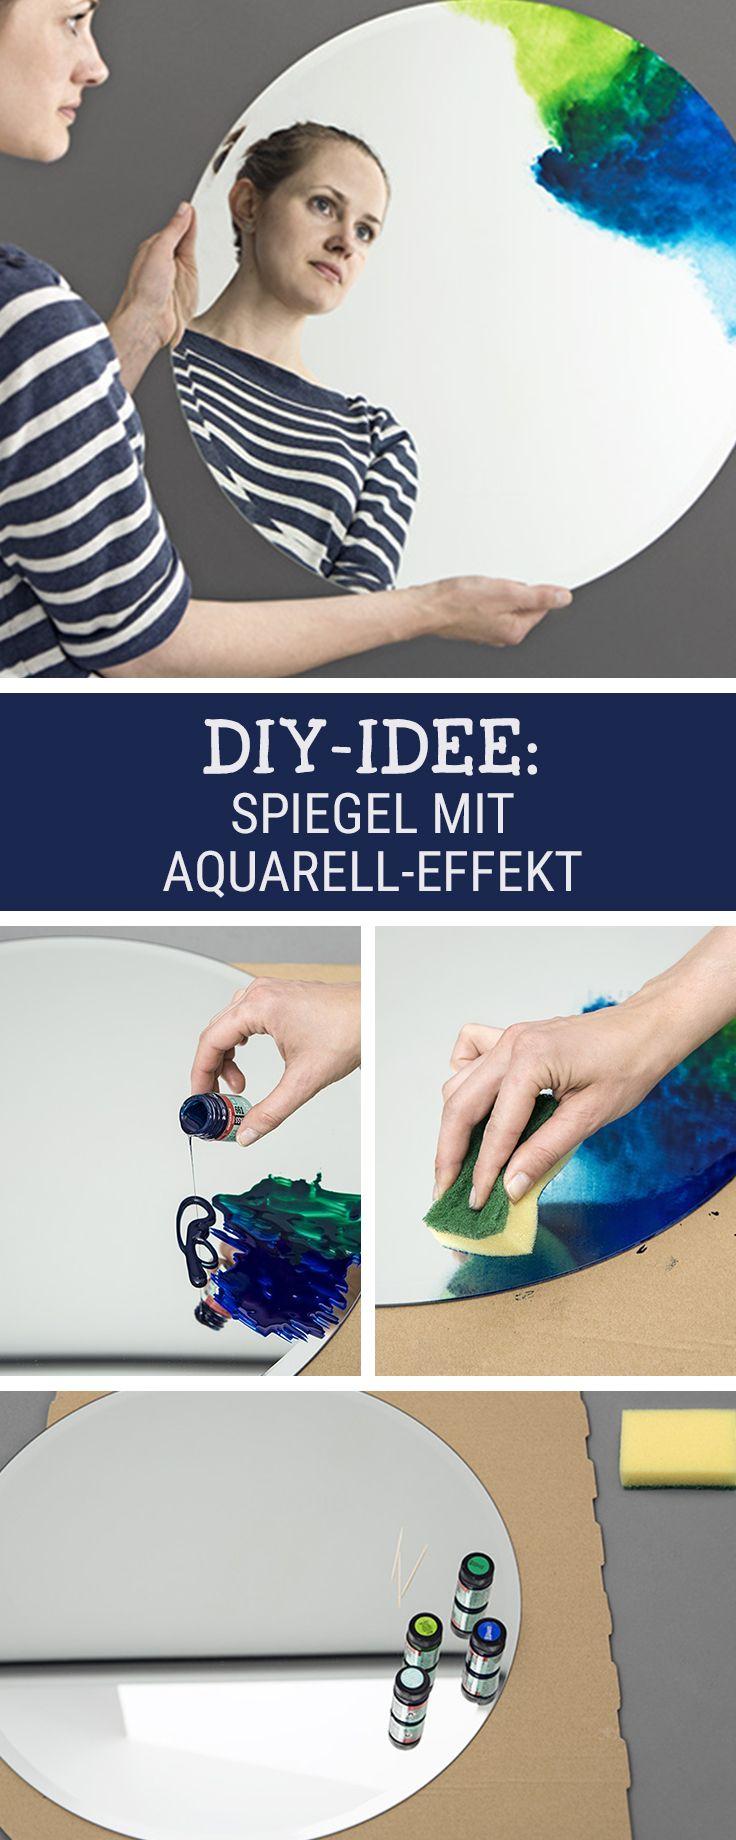 Wohn-DIY: So bastelst Du Dir einen Spiegel mit Aquarelleffekt / learn how to craft a mirror with a watercolor look via DaWanda.com